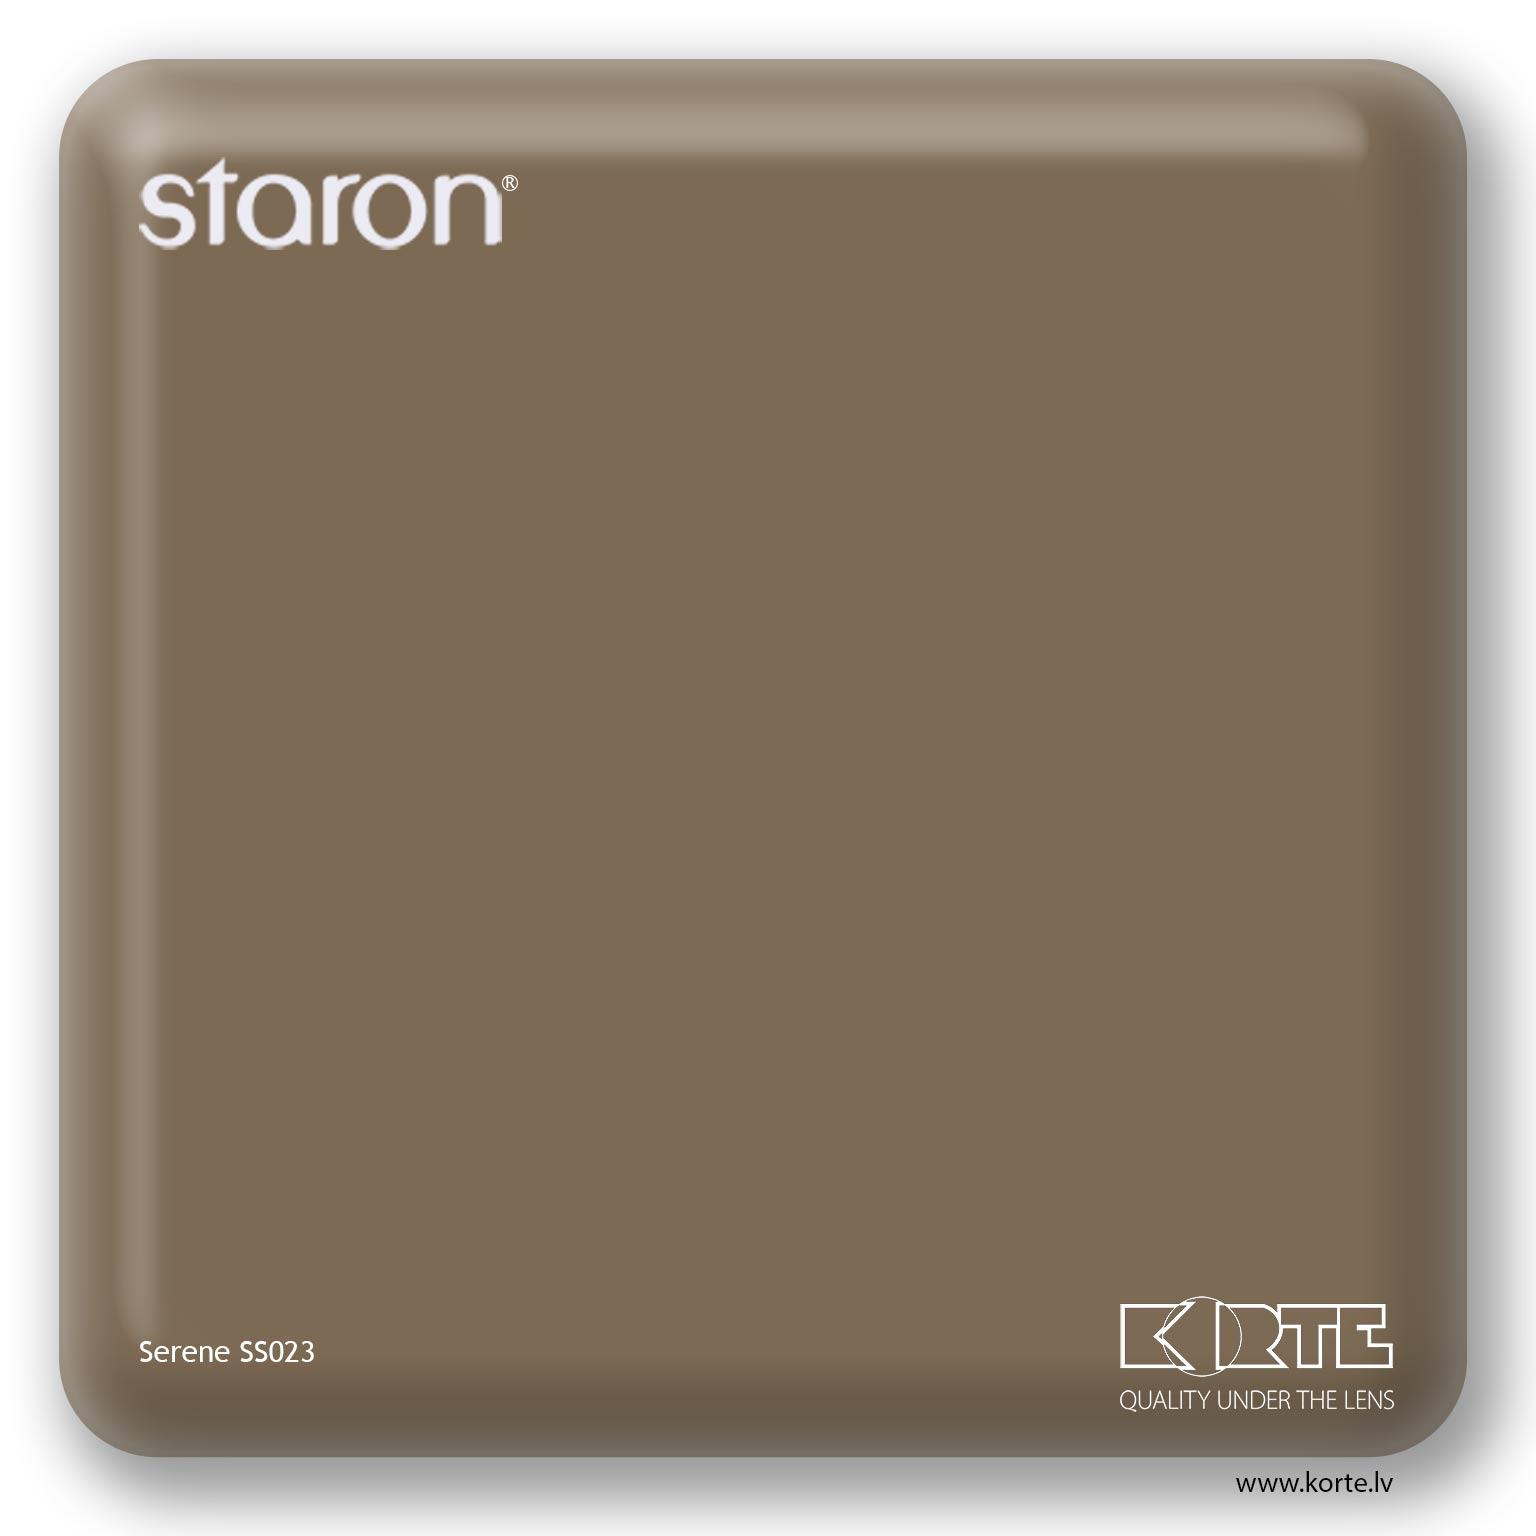 Staron Serene SS023